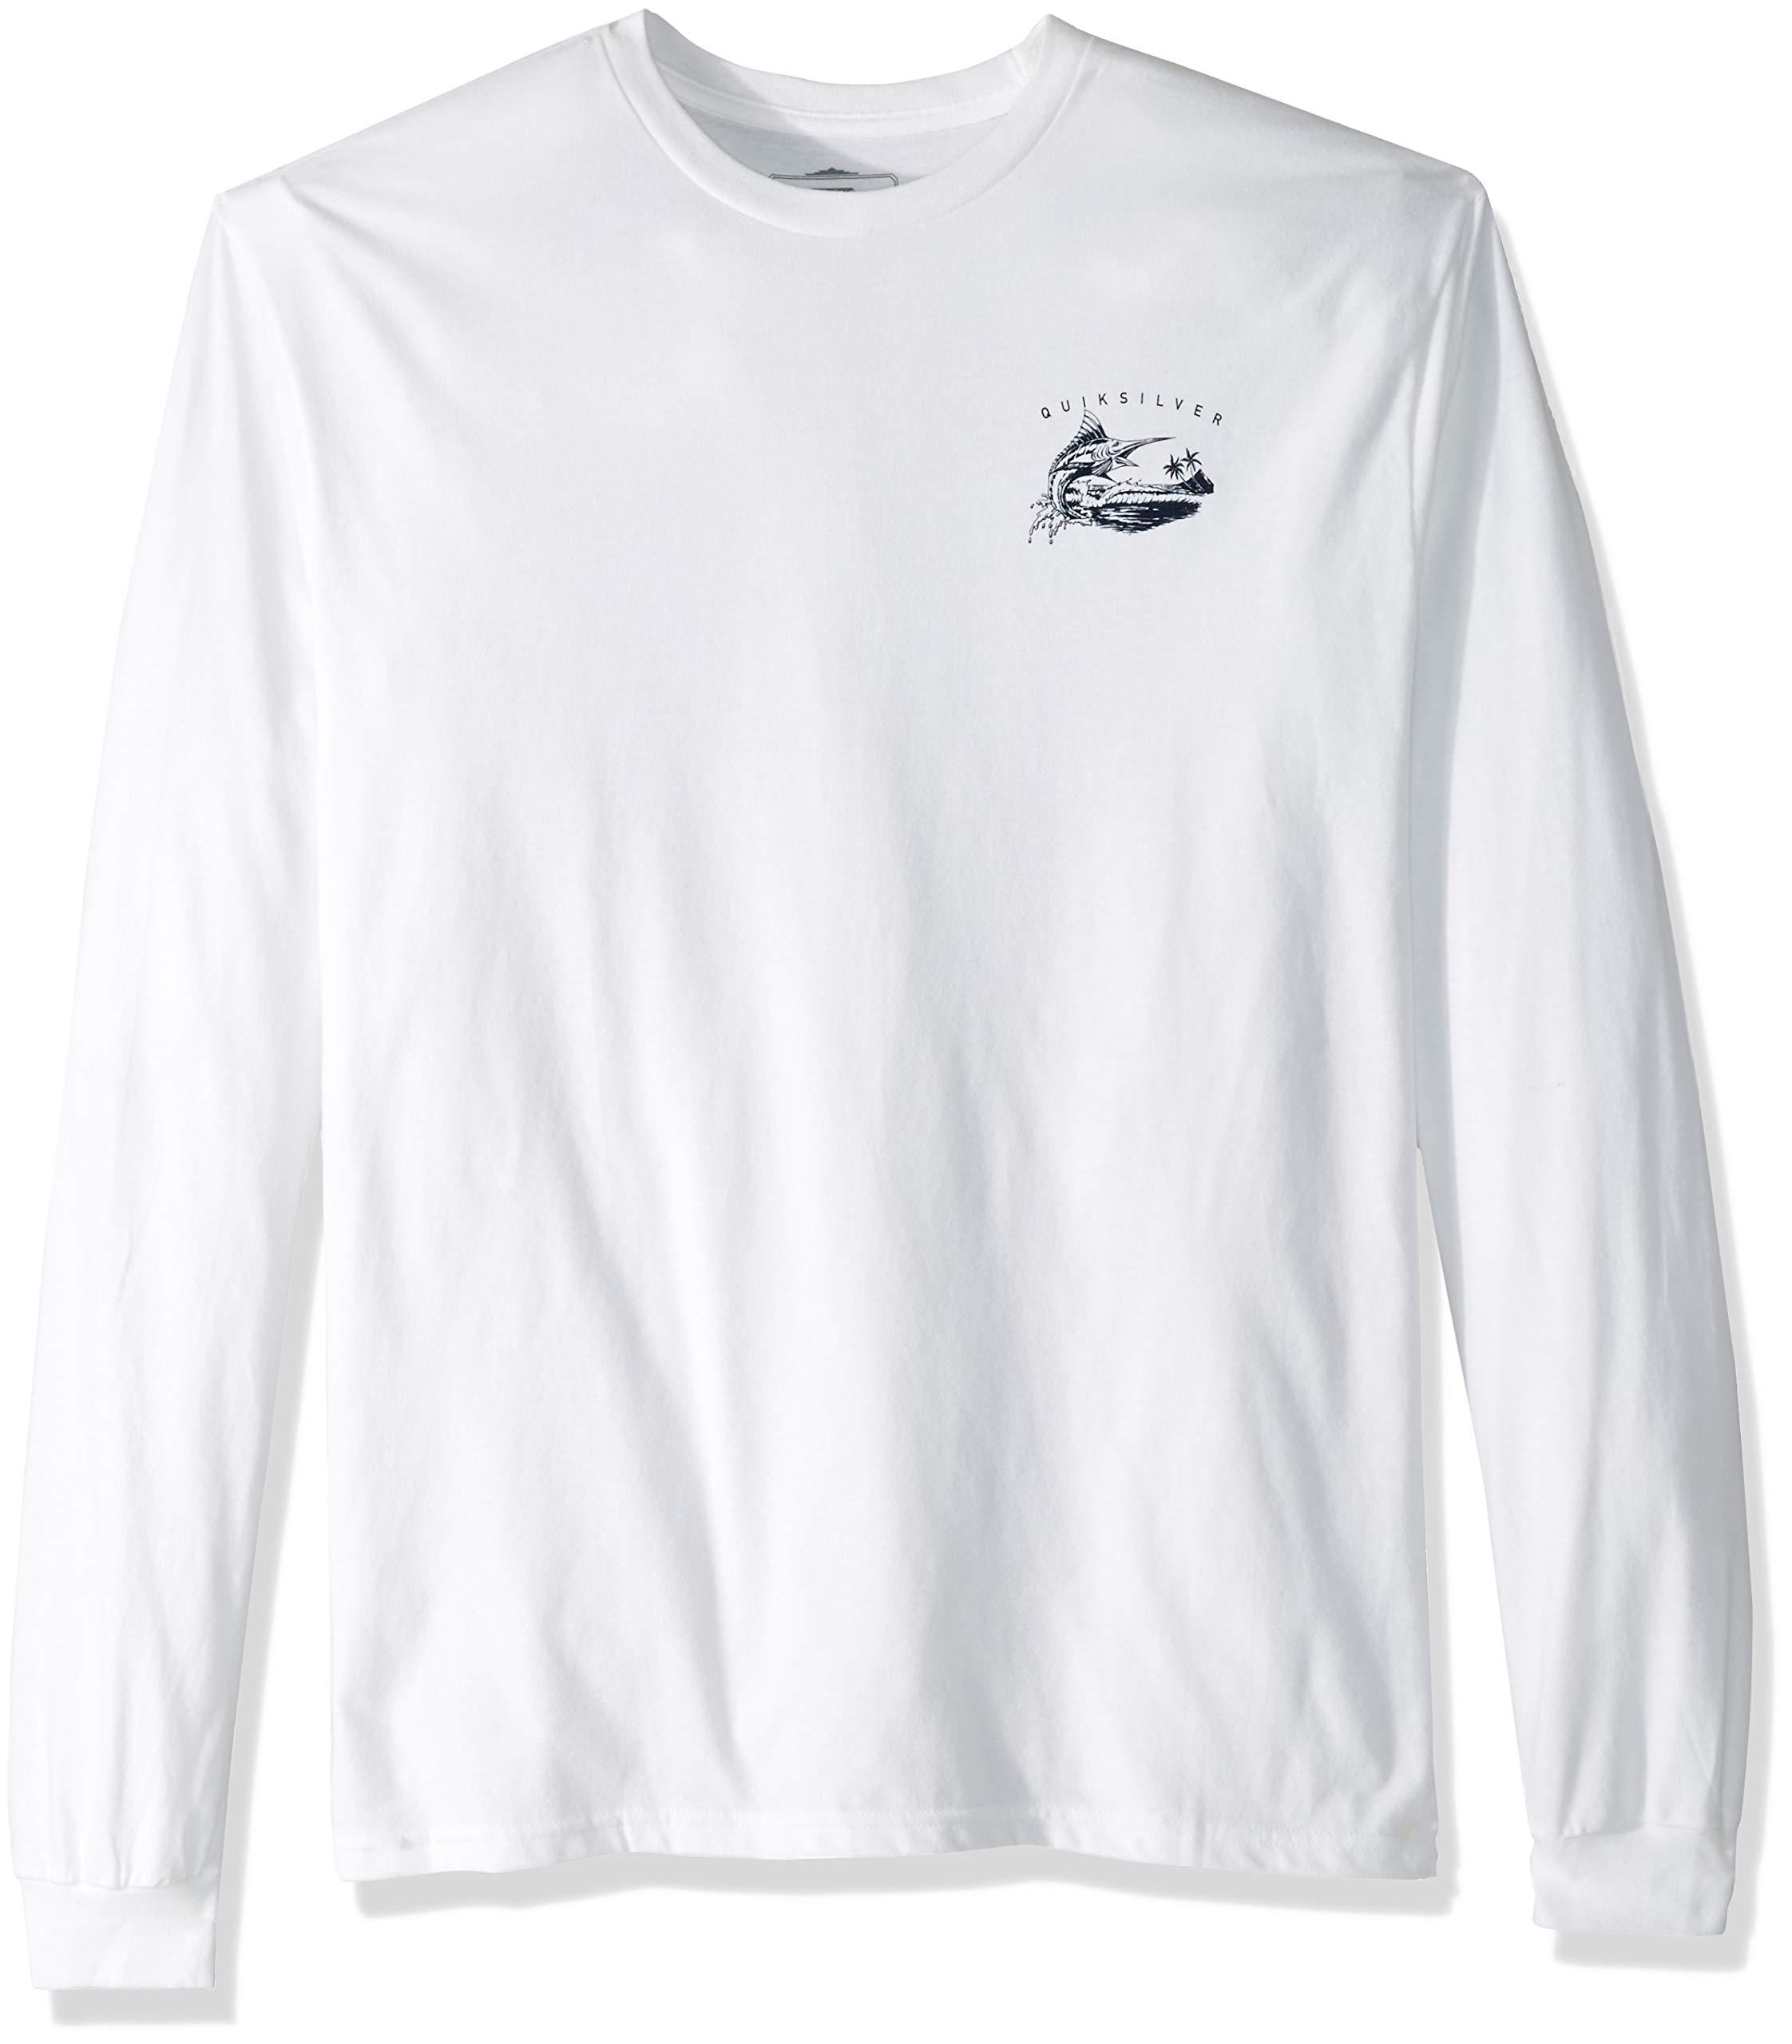 Quiksilver Men's Jumper Long Sleeve TEE Shirt, White, L